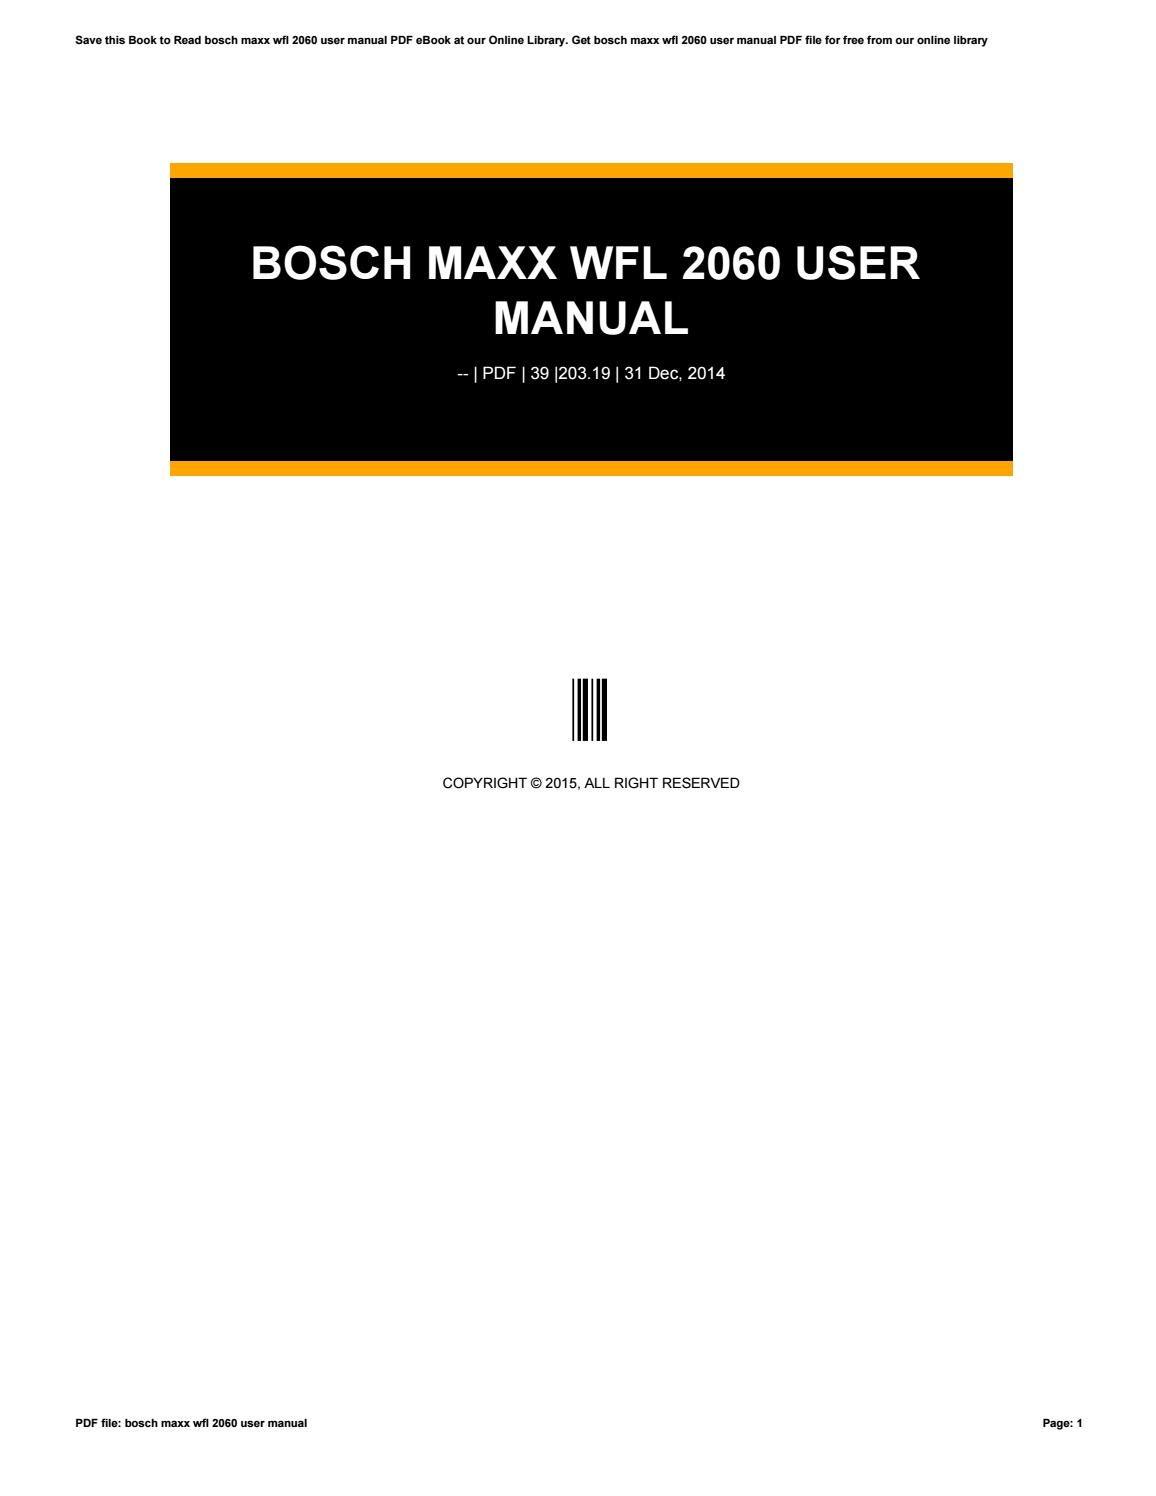 bosch maxx 900 instruction manual